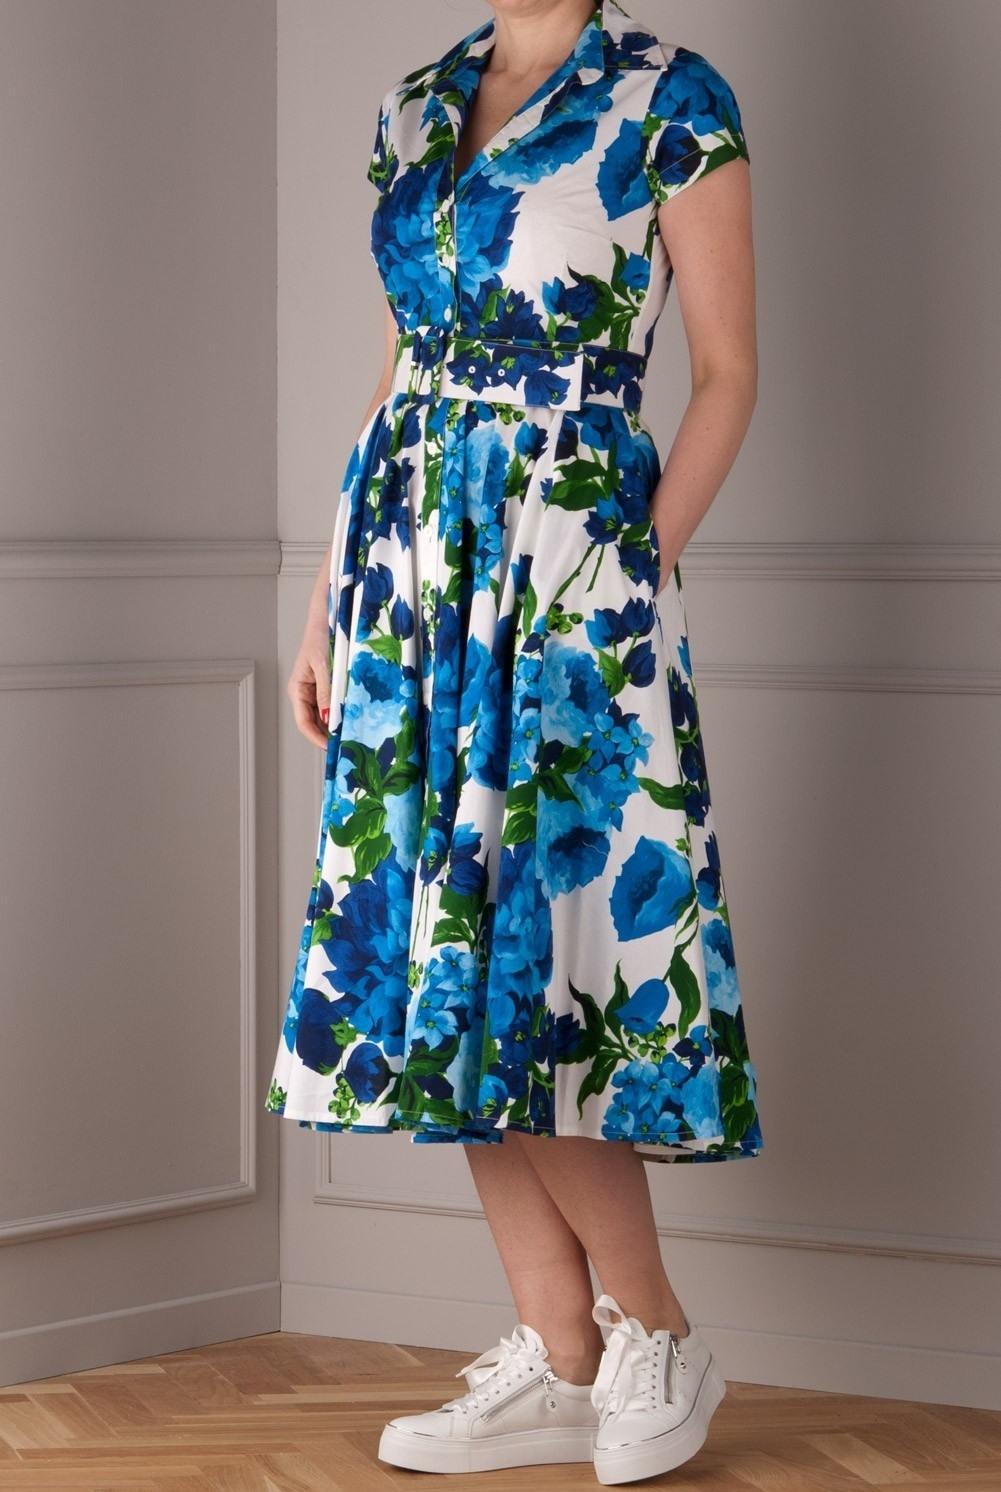 13 Genial Kleid Grün Blau Design Spektakulär Kleid Grün Blau Vertrieb